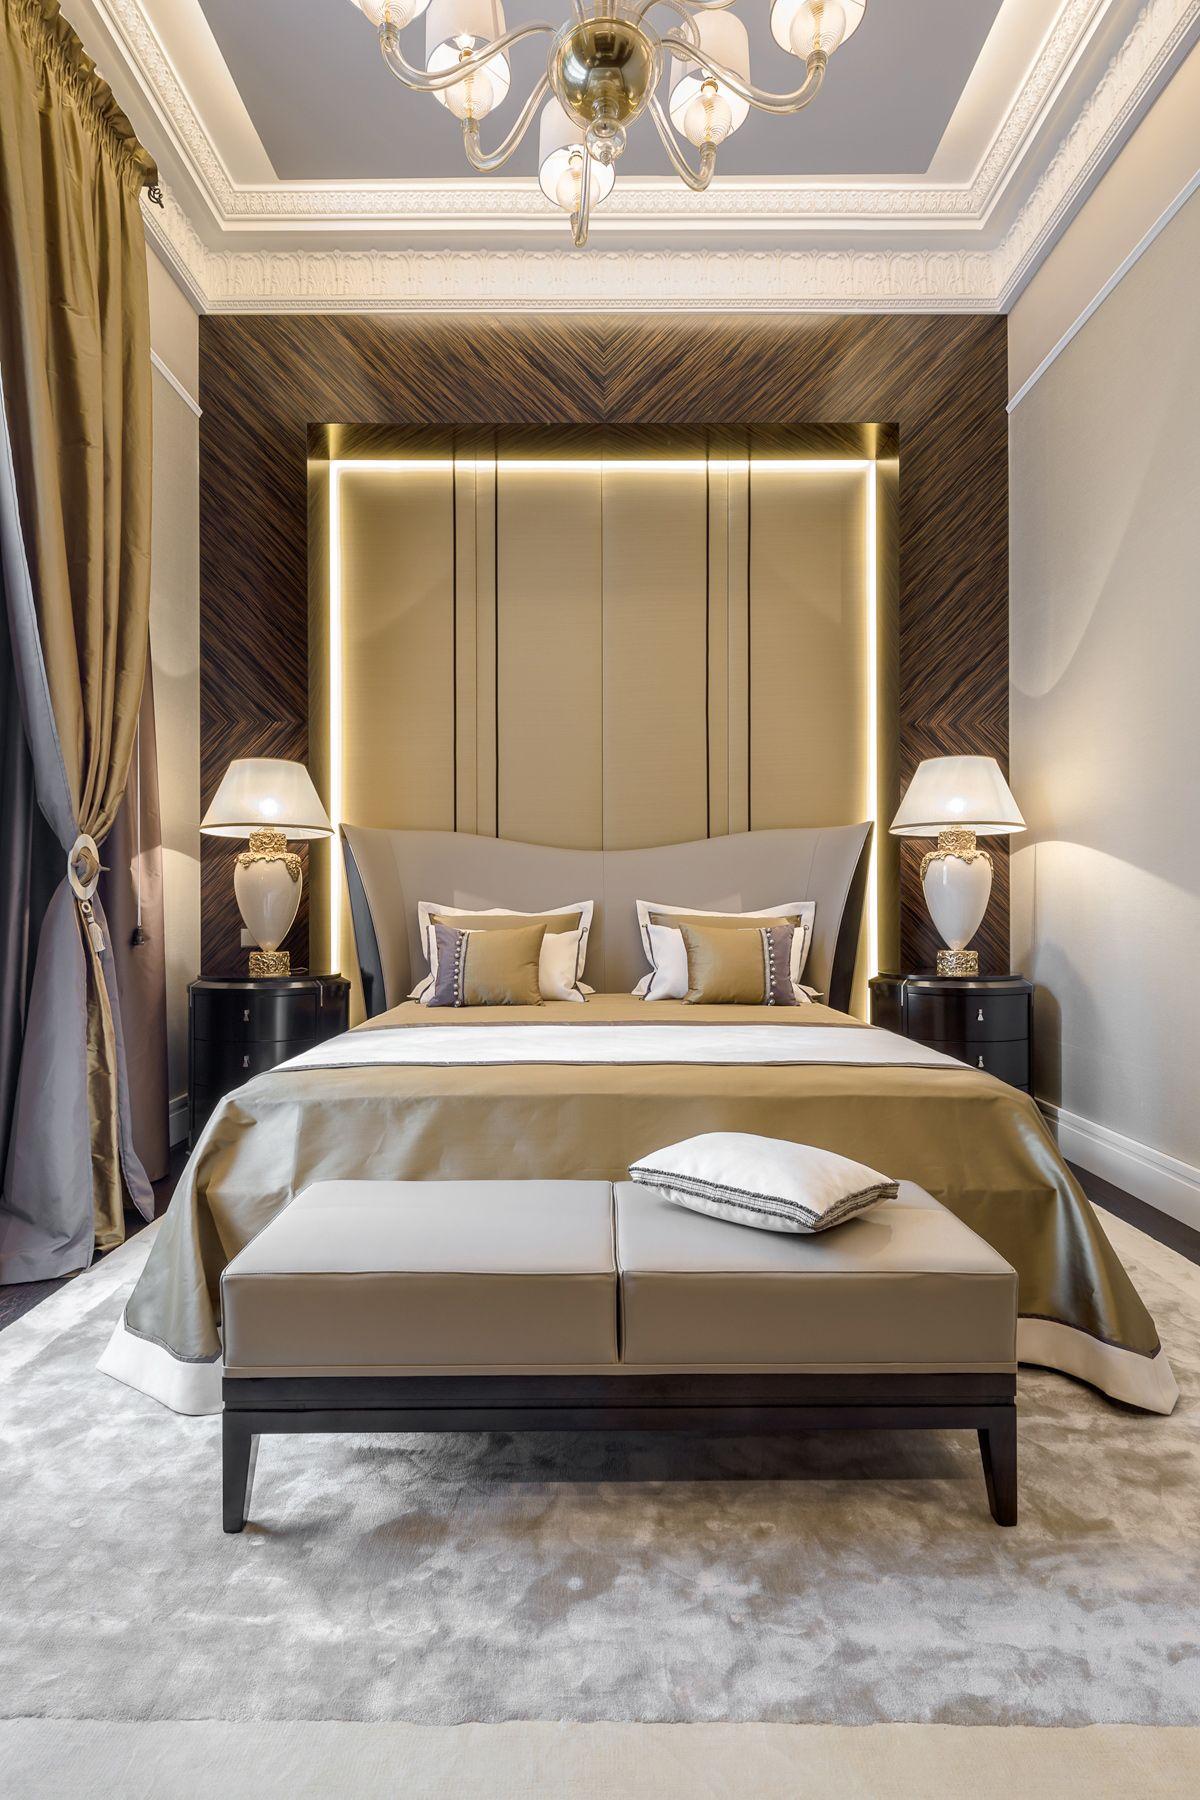 3 bhk wohndesign Фото спальня Загородный дом  modern master bedroom design